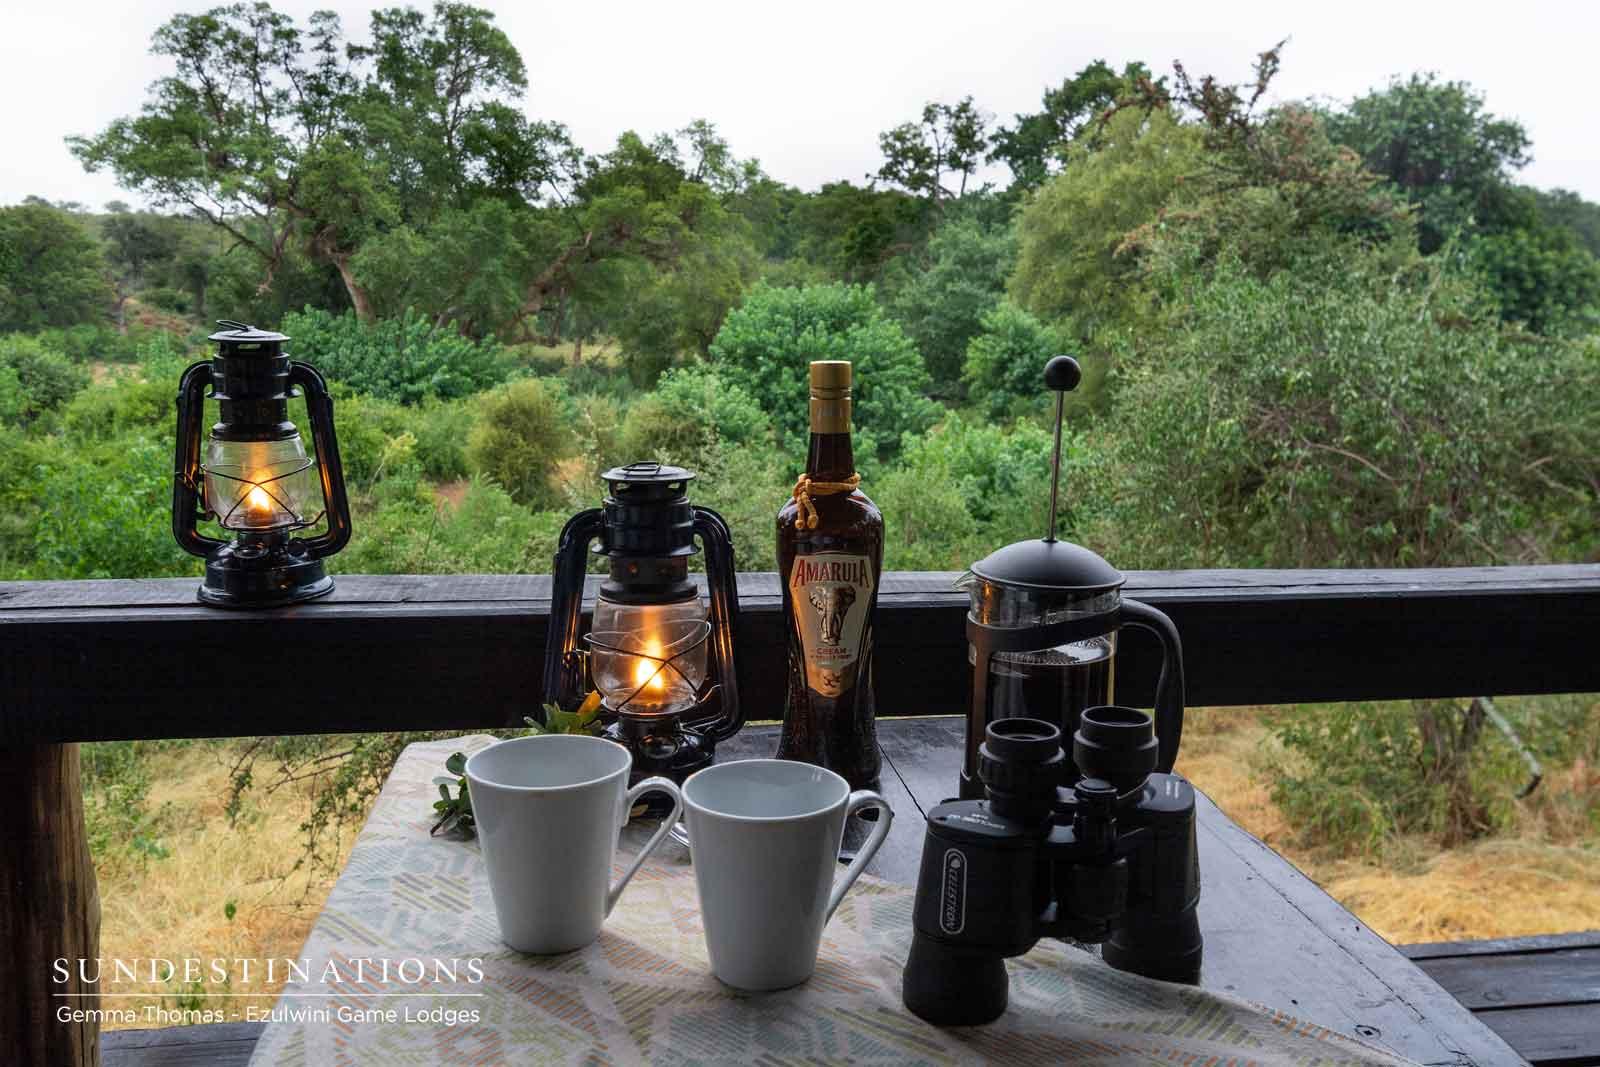 Morning Amarula Coffee at Ezulwini Game Lodges